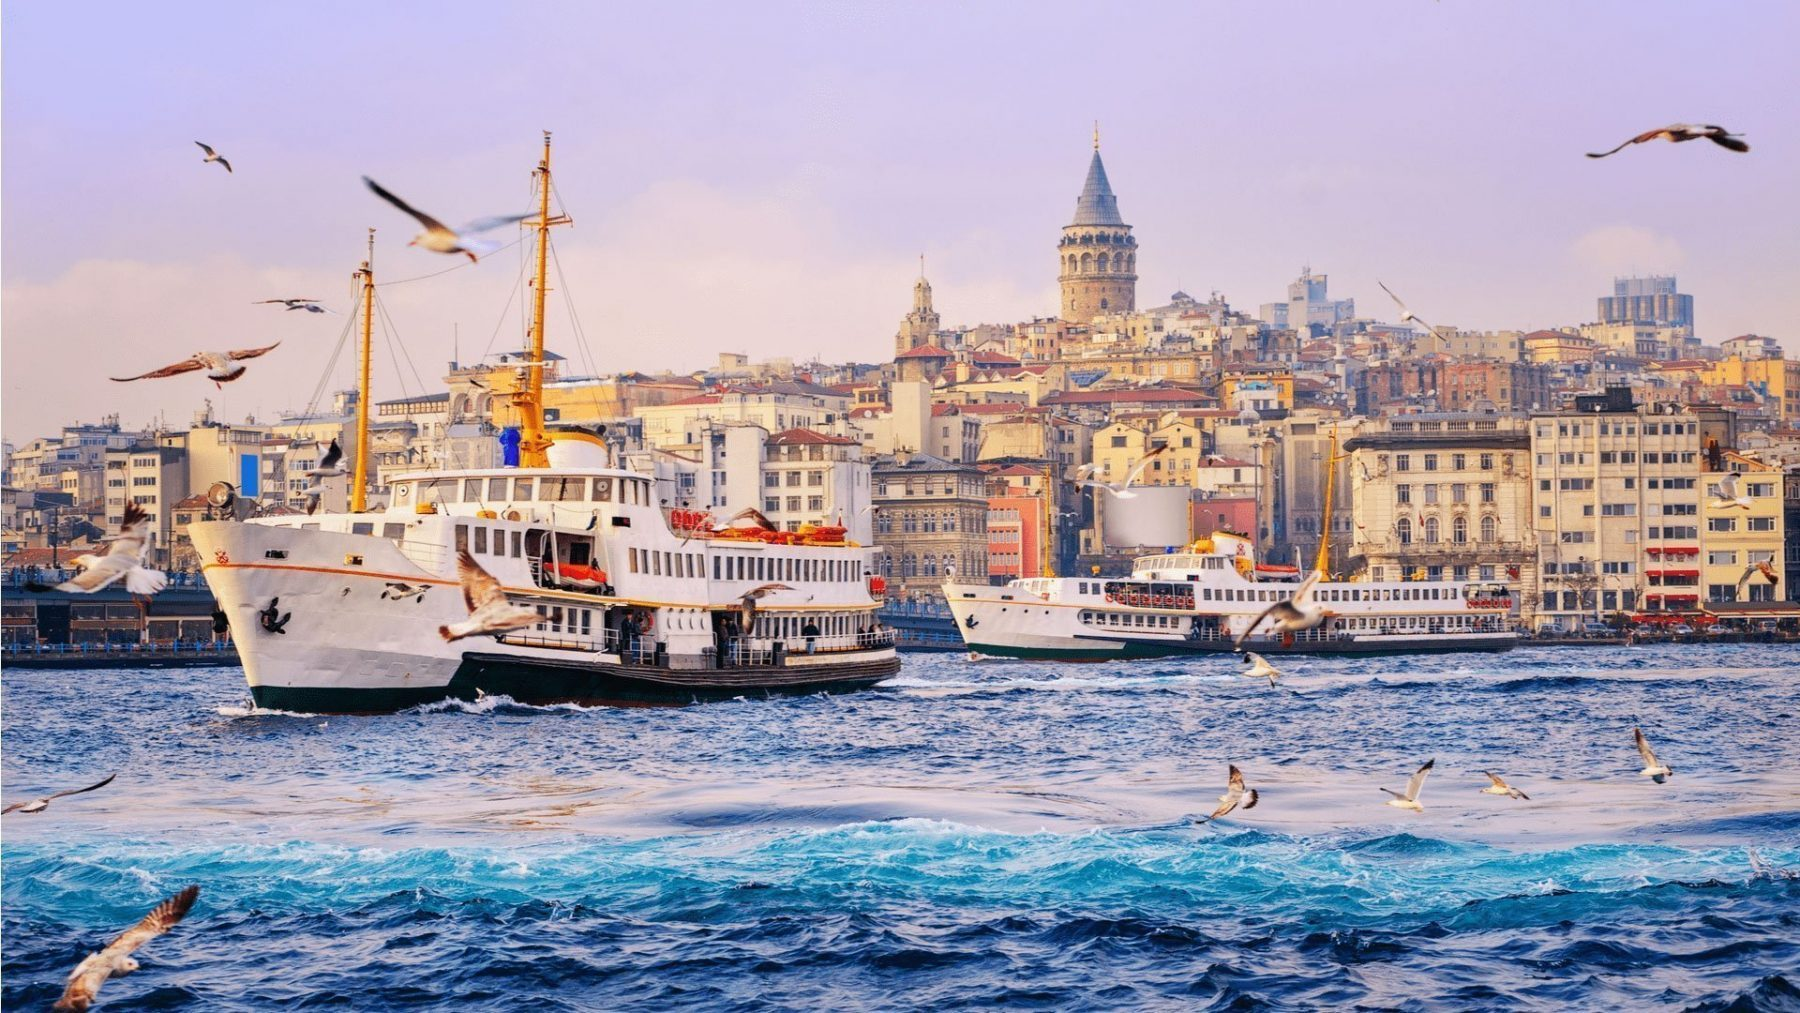 Turquia Informações